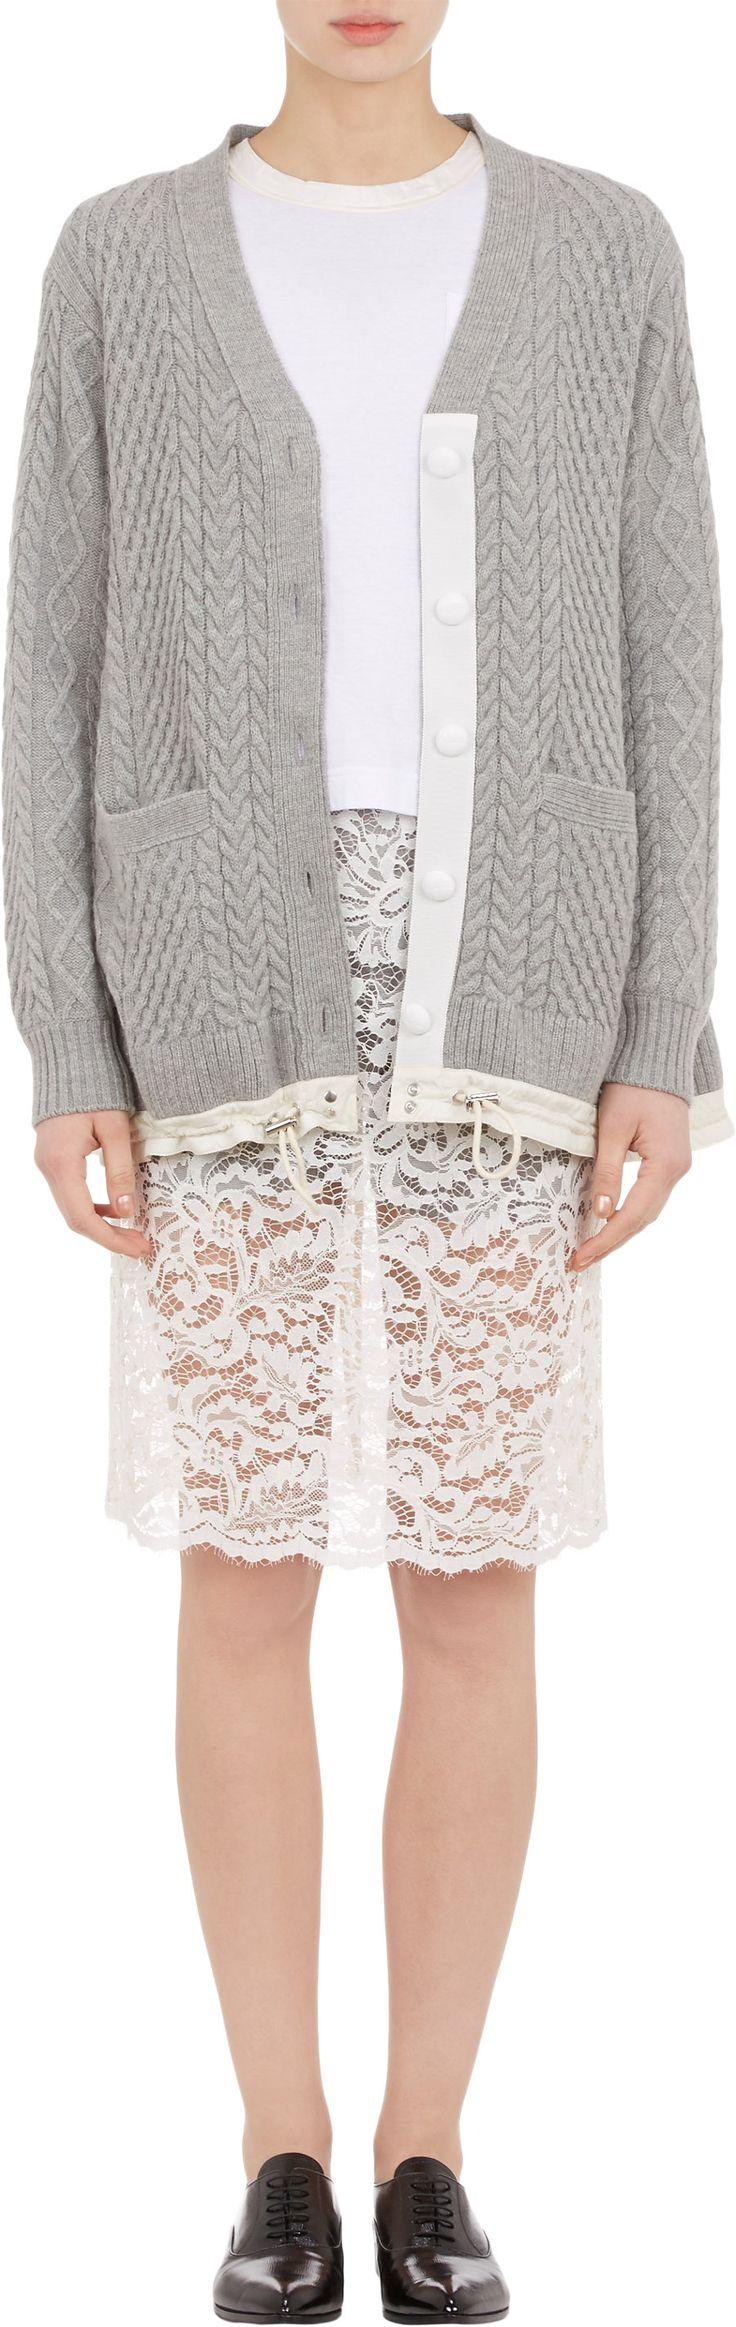 Sacai Luck Cable-Knit Drawstring Swing Cardigan at Barneys.com